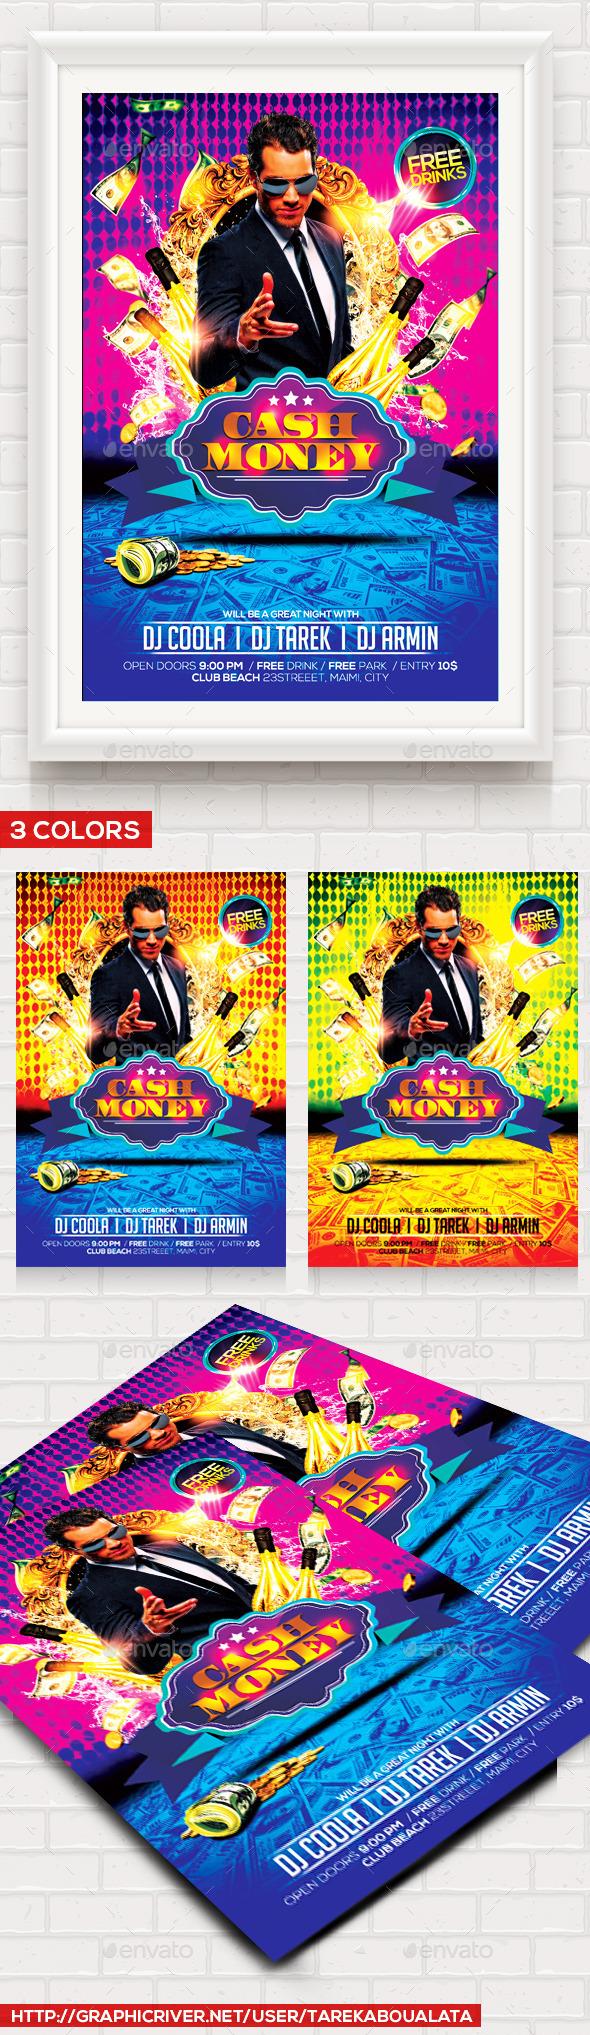 Cash Money Flyer Template V By TarekAboualata GraphicRiver - Money flyer template